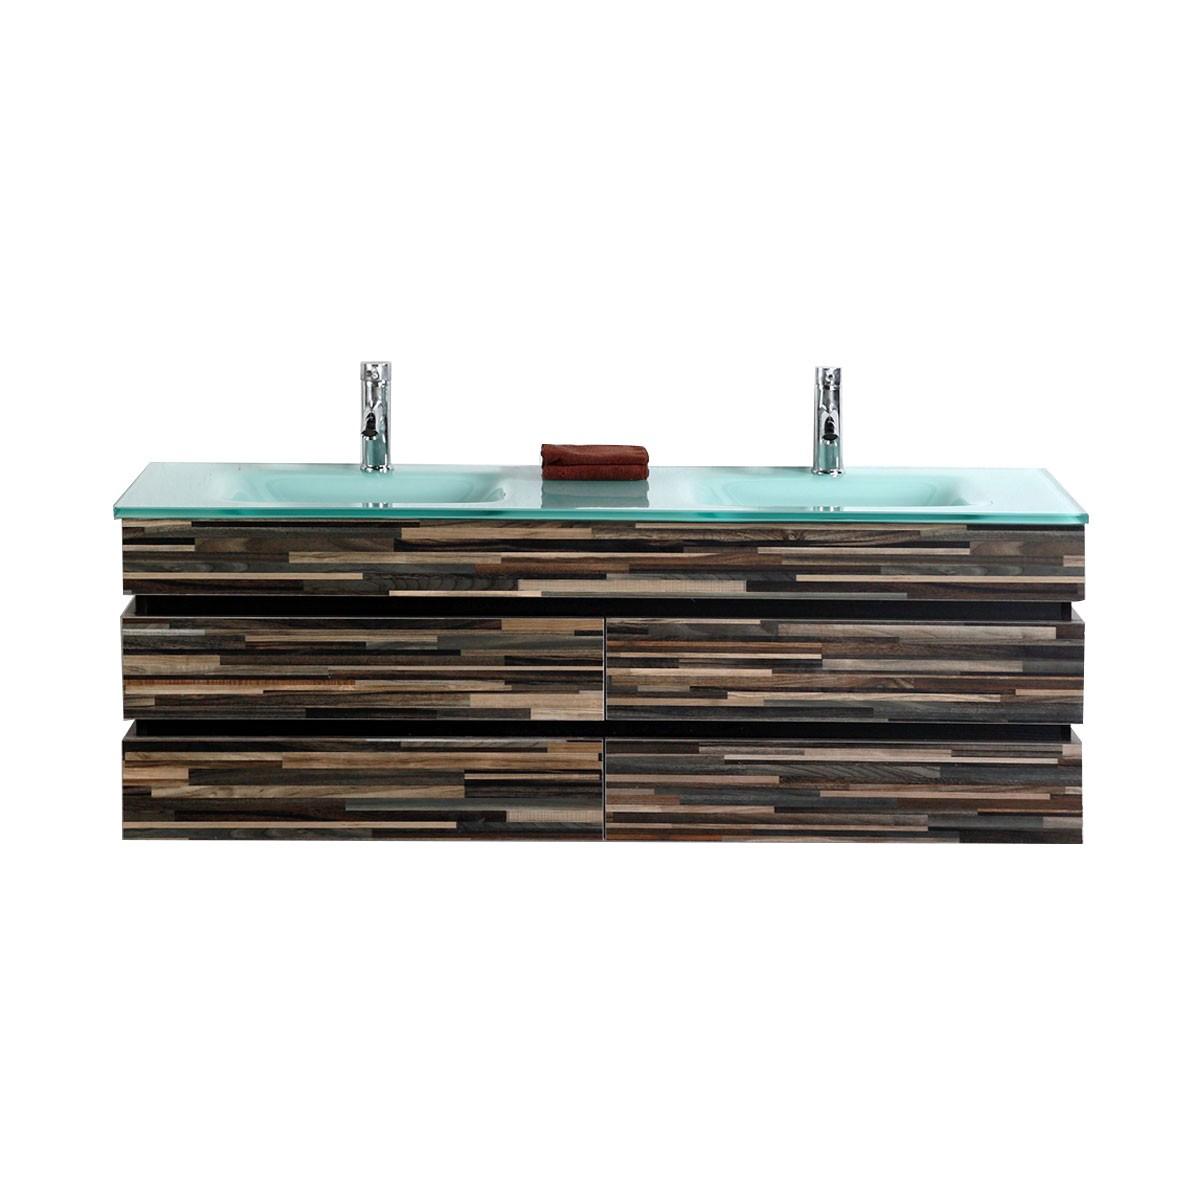 55 In. Wall Mount Bathroom Vanity (VS-8861-V)